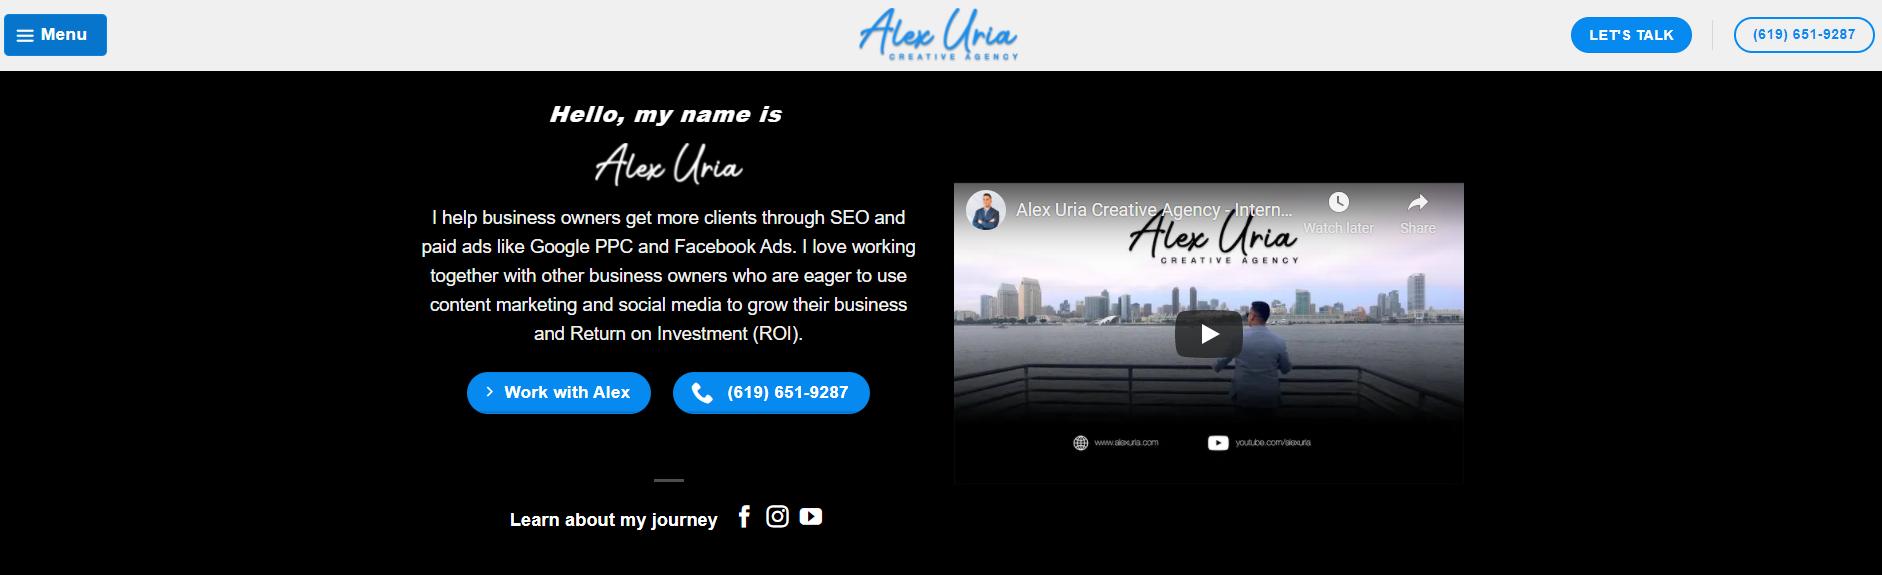 Alex Uria - Content Marketing and SEO Services